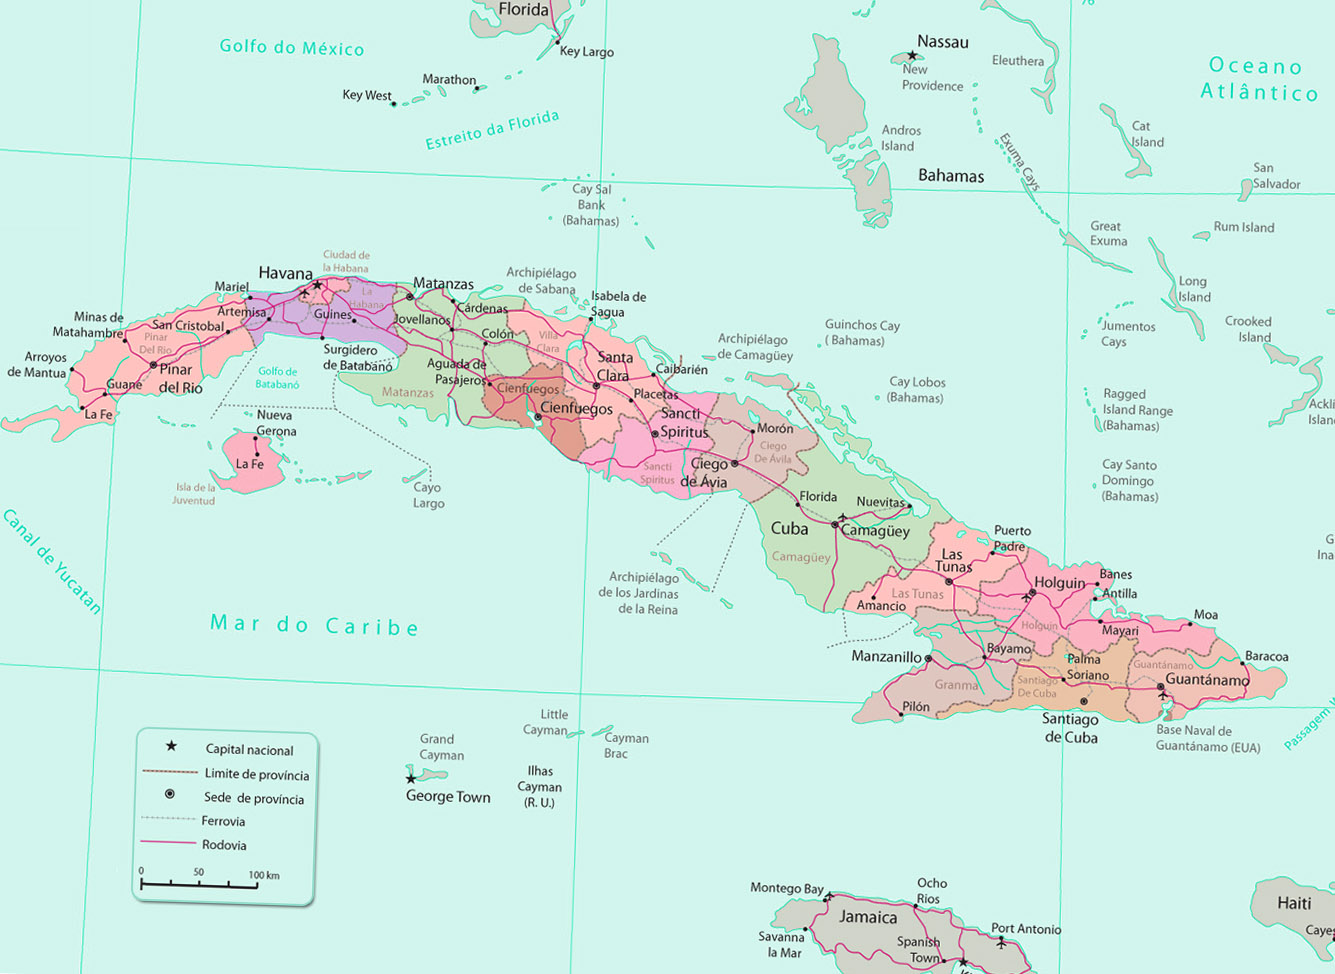 Onde fica Cuba no mapa do Caribe?